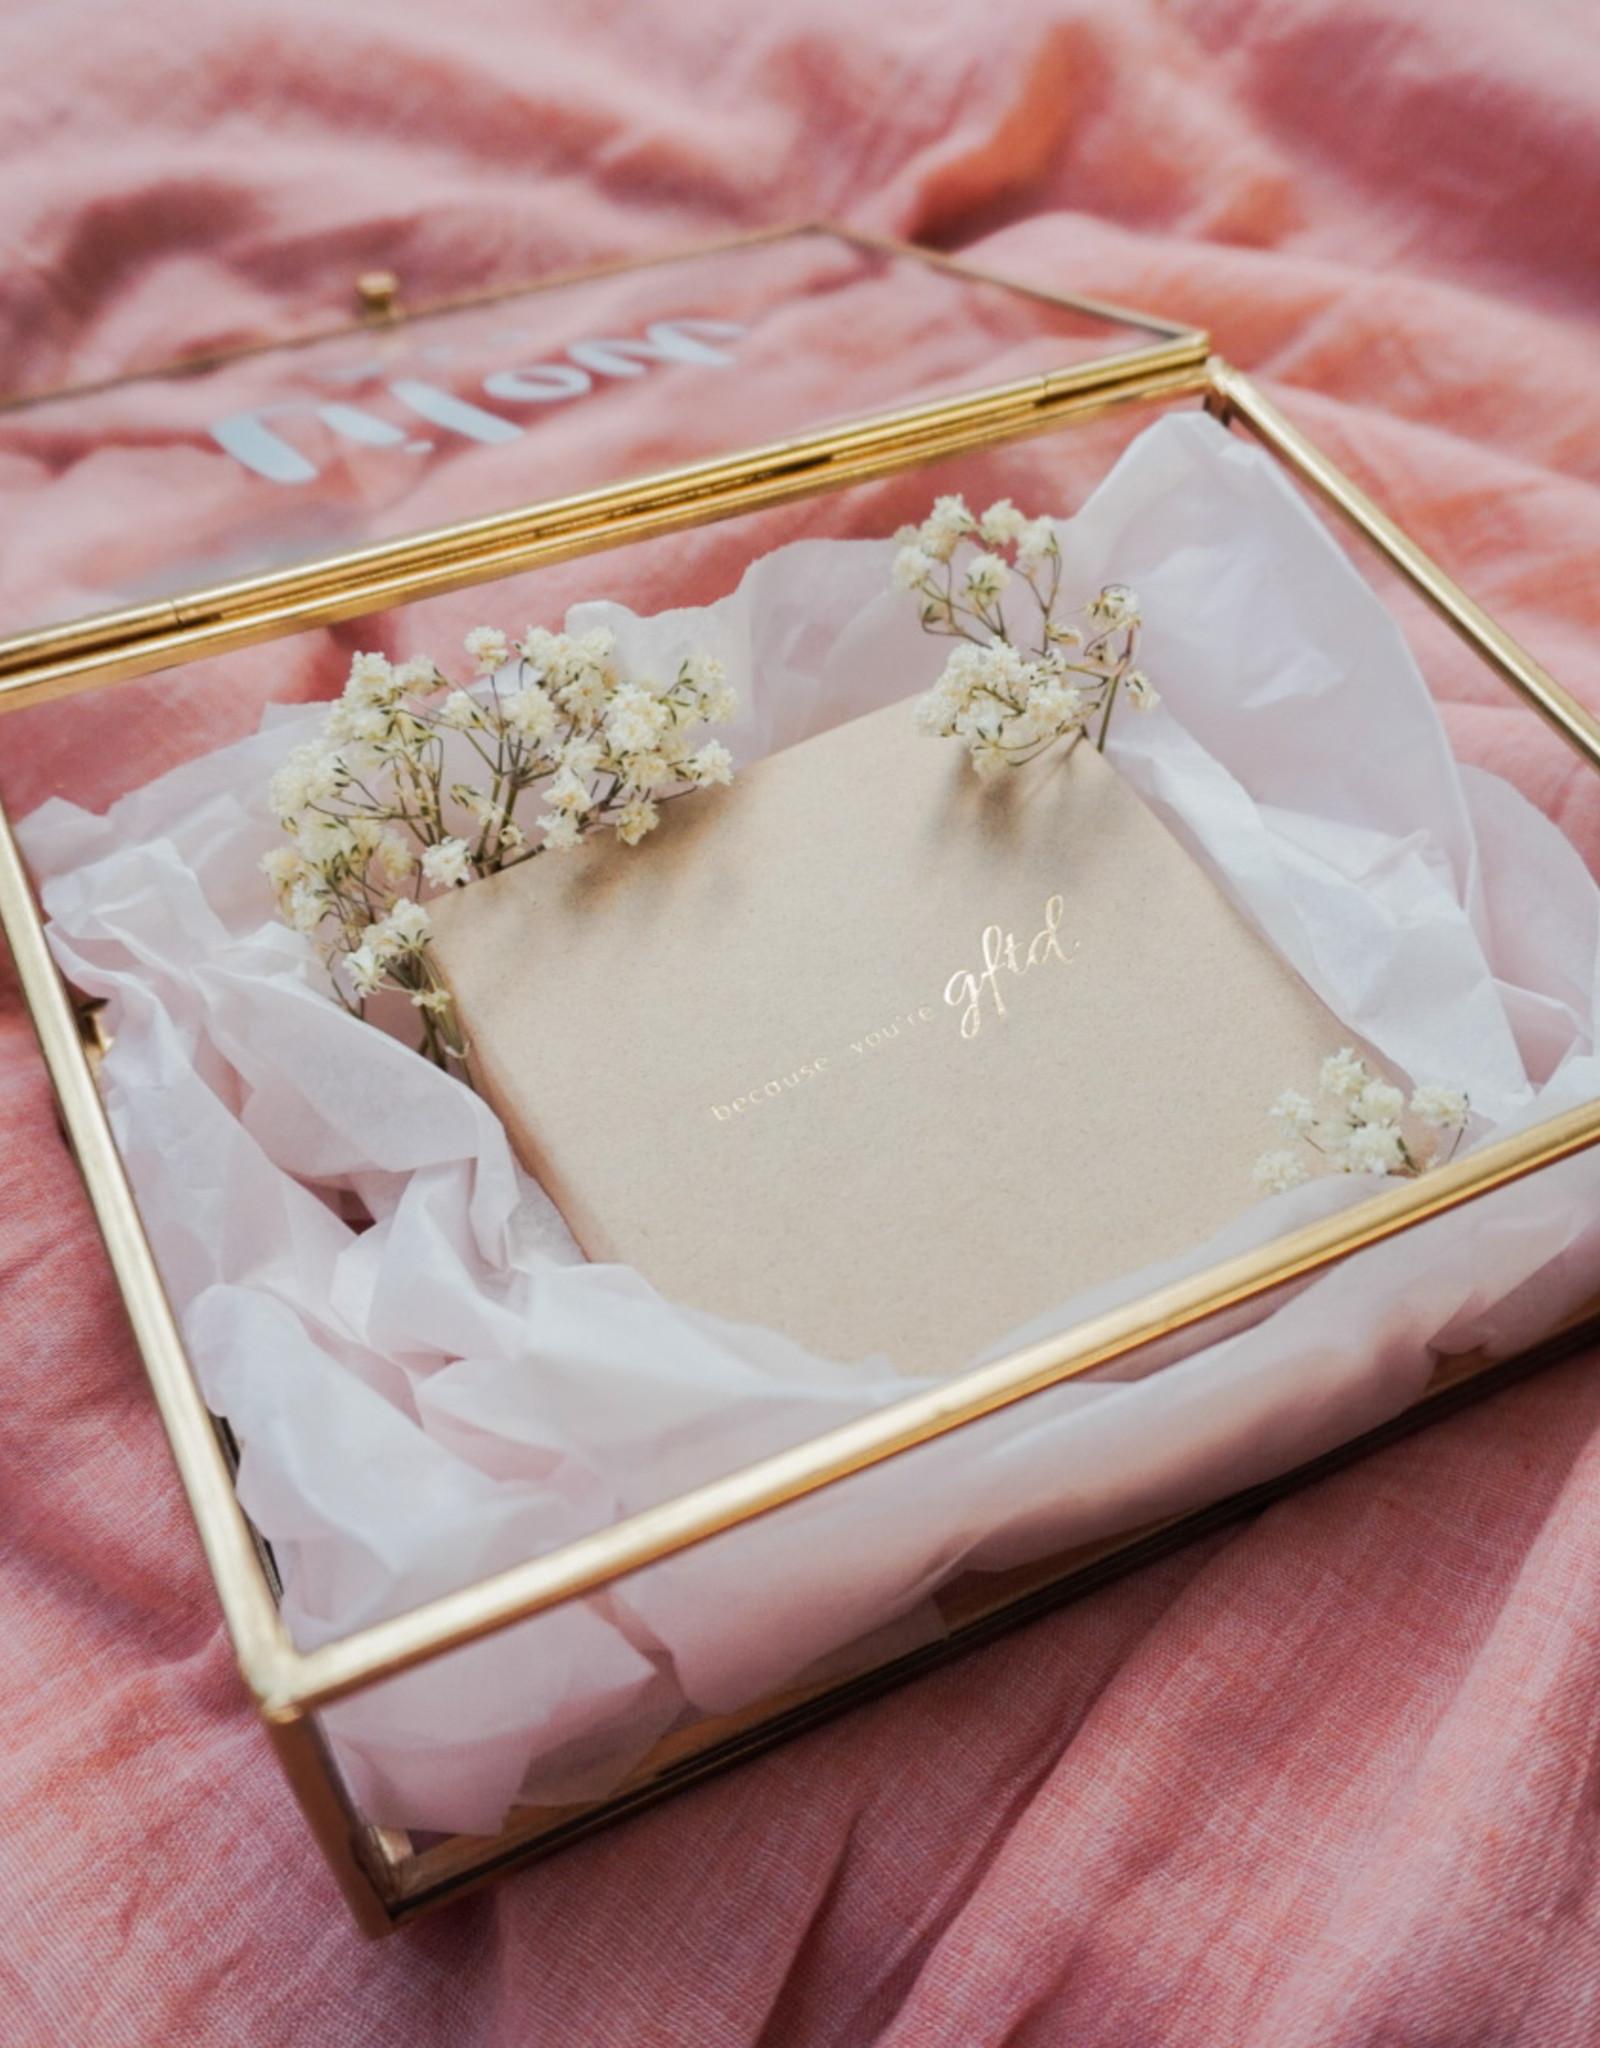 Your gftd. jewelry in a unique memory box